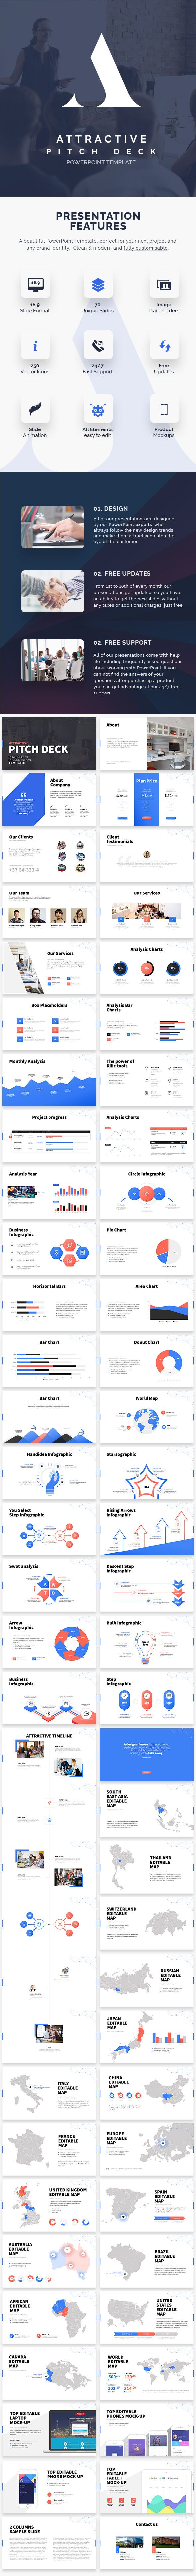 Attractive pitch deck powerpoint presentation business attractive pitch deck powerpoint presentation toneelgroepblik Images